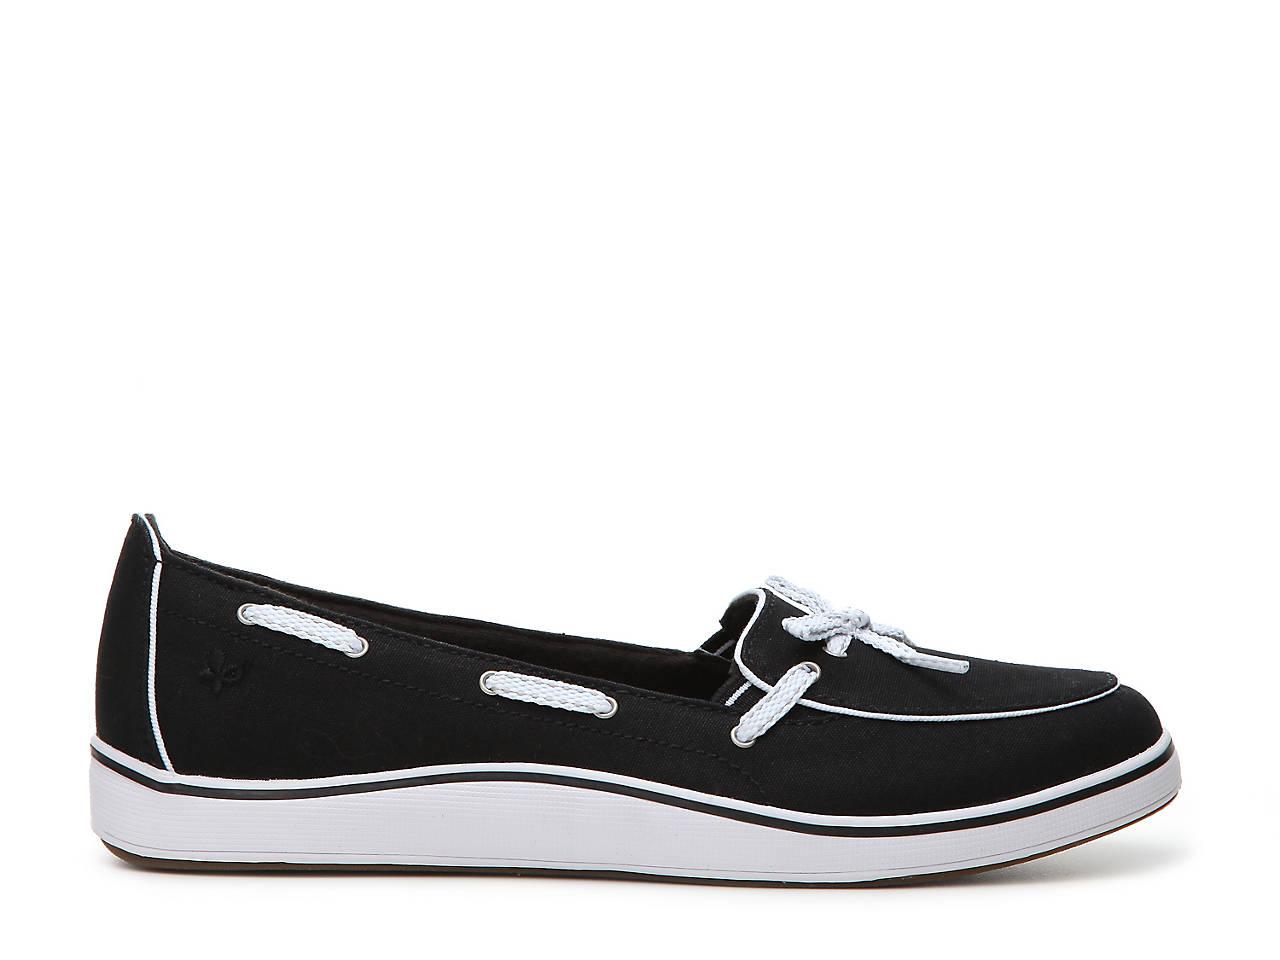 11afe7d12e3 Grasshoppers Windham Boat Shoe Women s Shoes